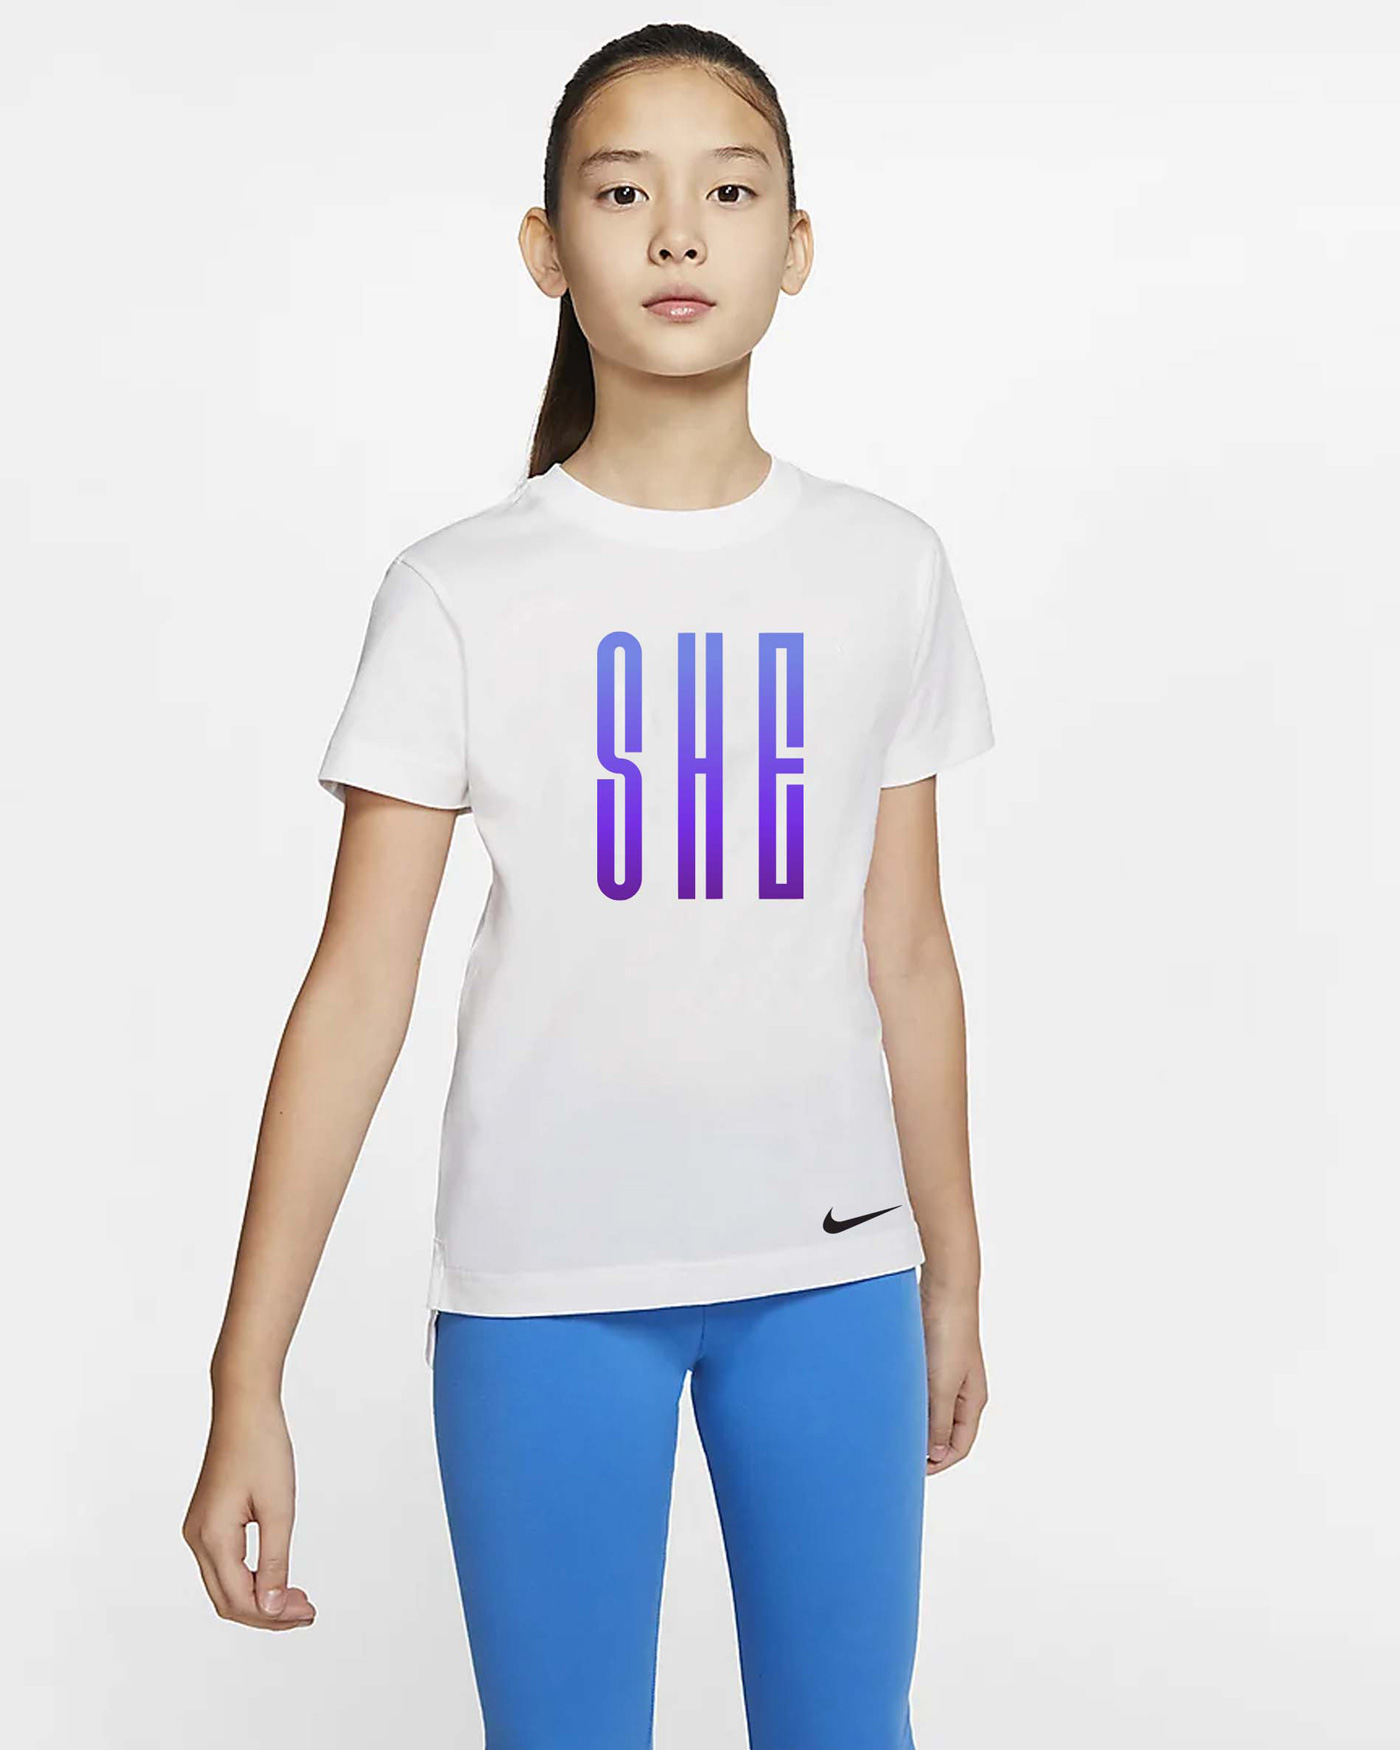 Karroach-Nike-clothing02